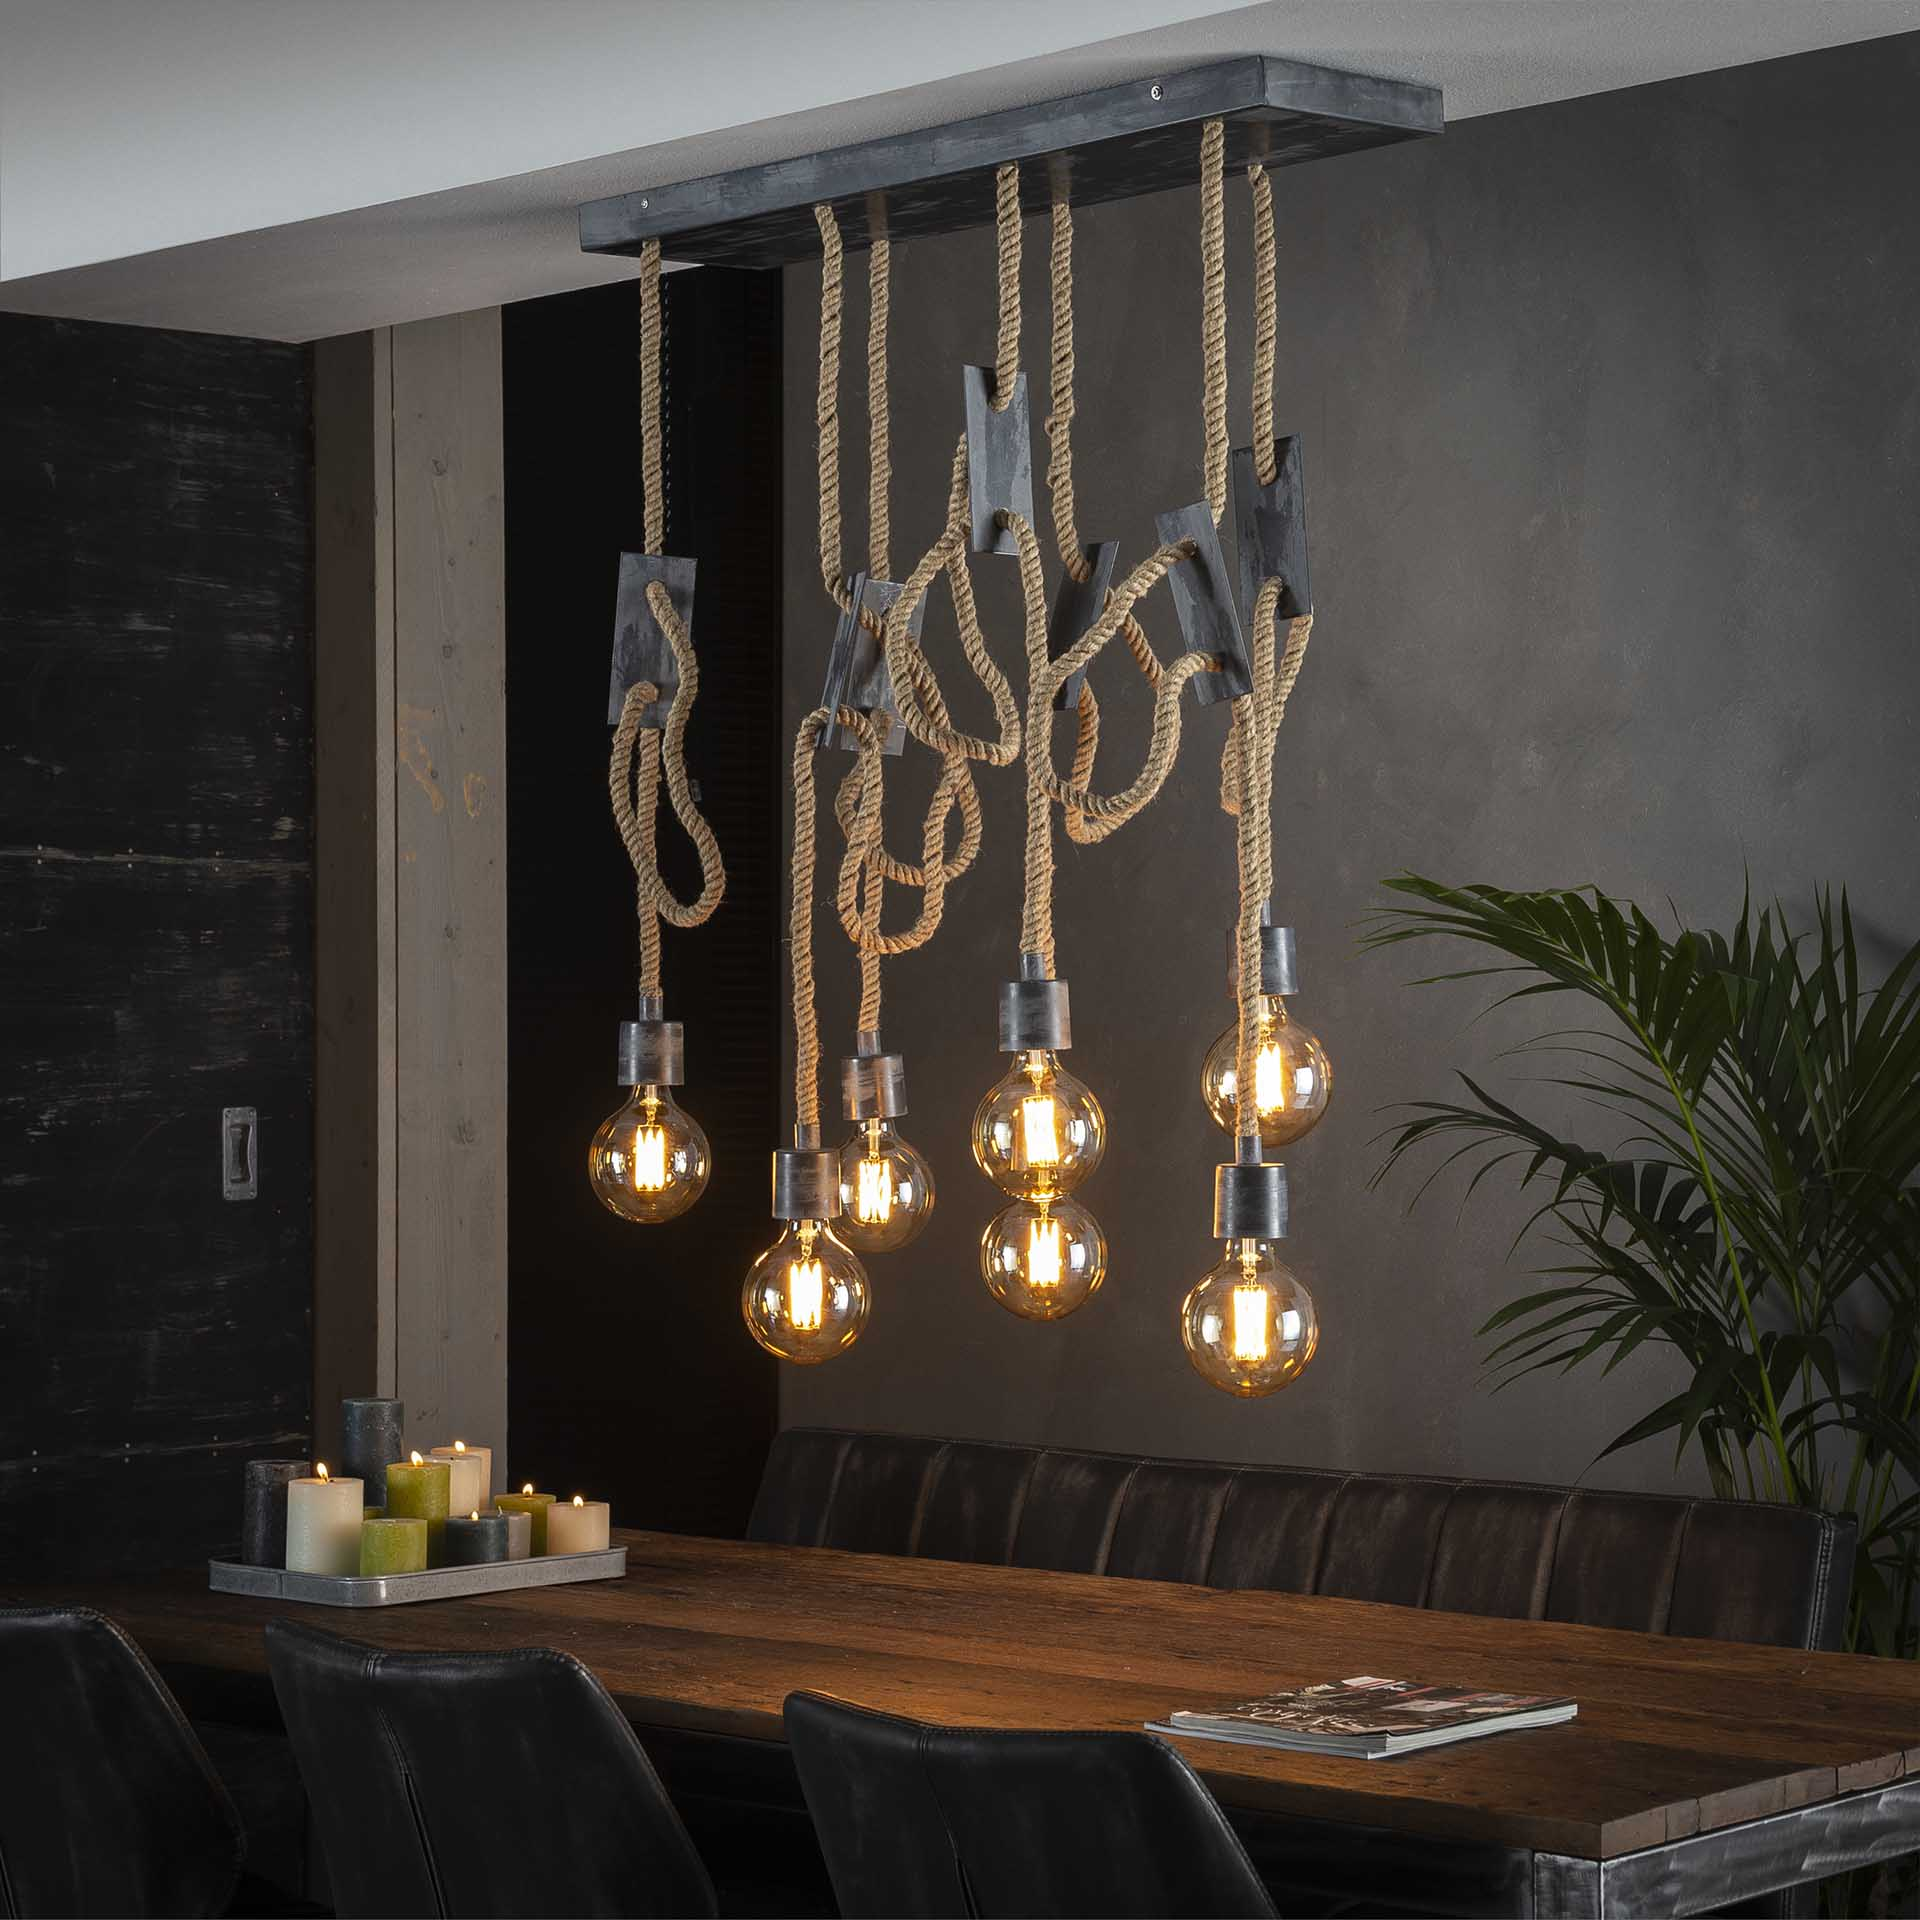 Hanglamp 7L touw 3+4 - Grijs